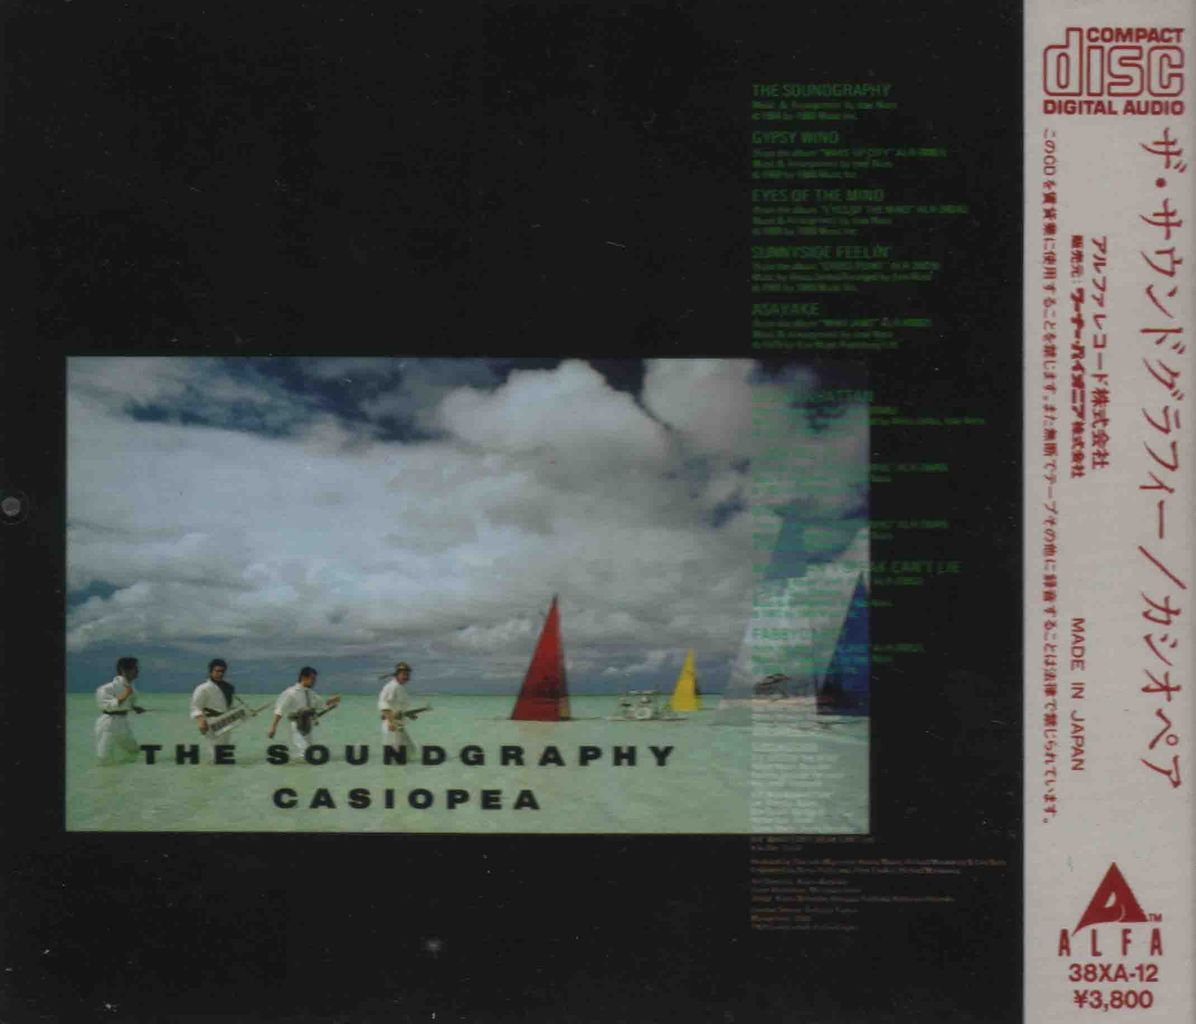 THE SOUNDGRAPHY-2